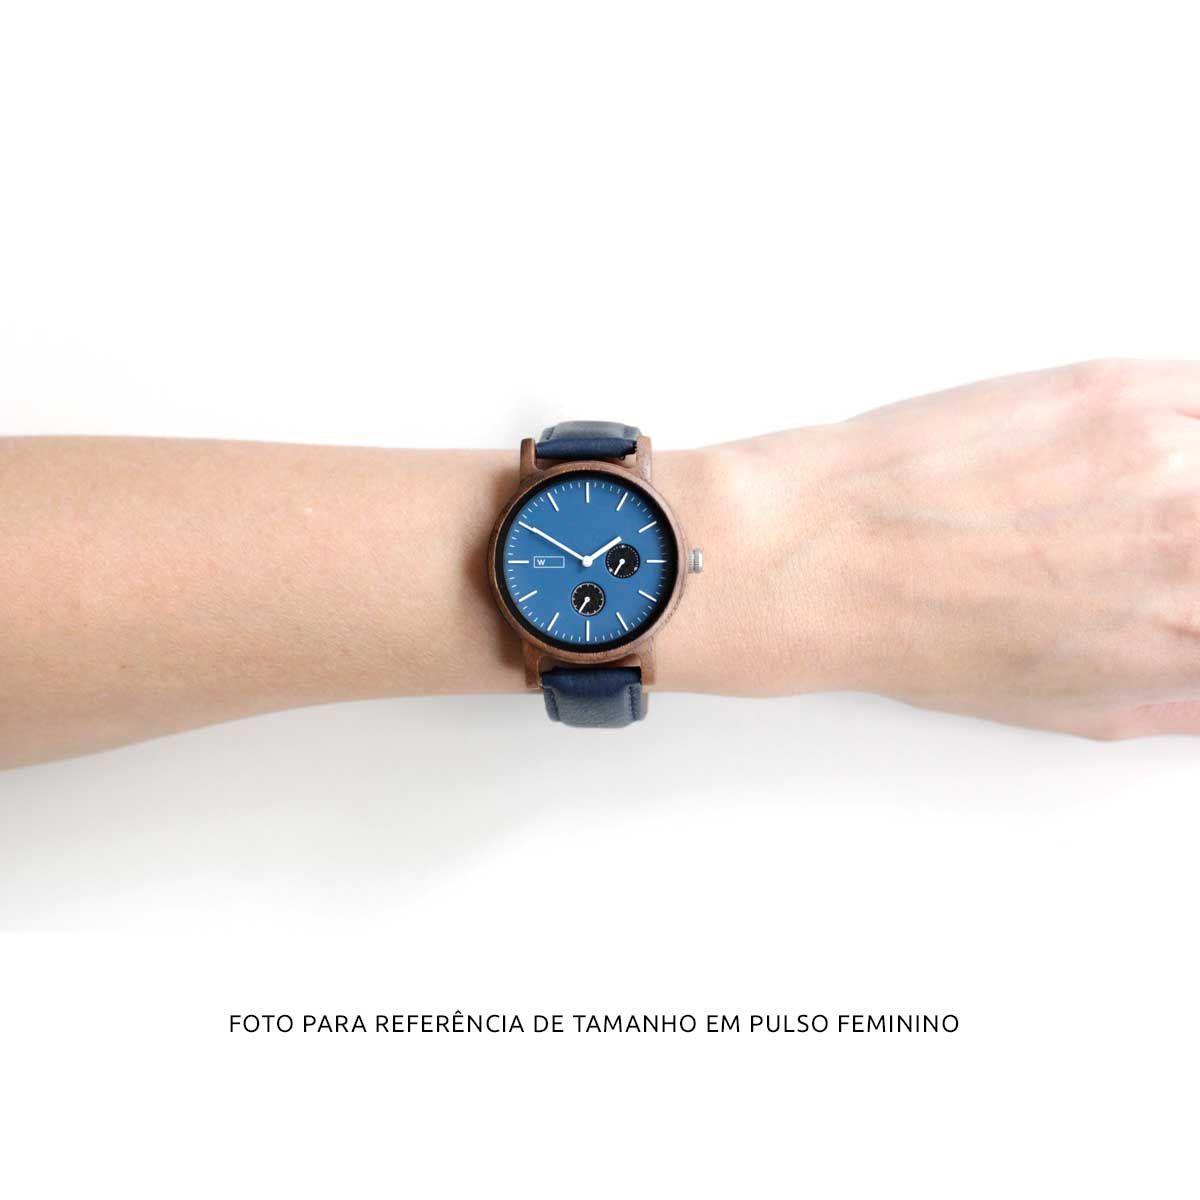 Relógio de Madeira Woodz Kor Blue (Pulseira de Couro Azul) #caixasdemadeira